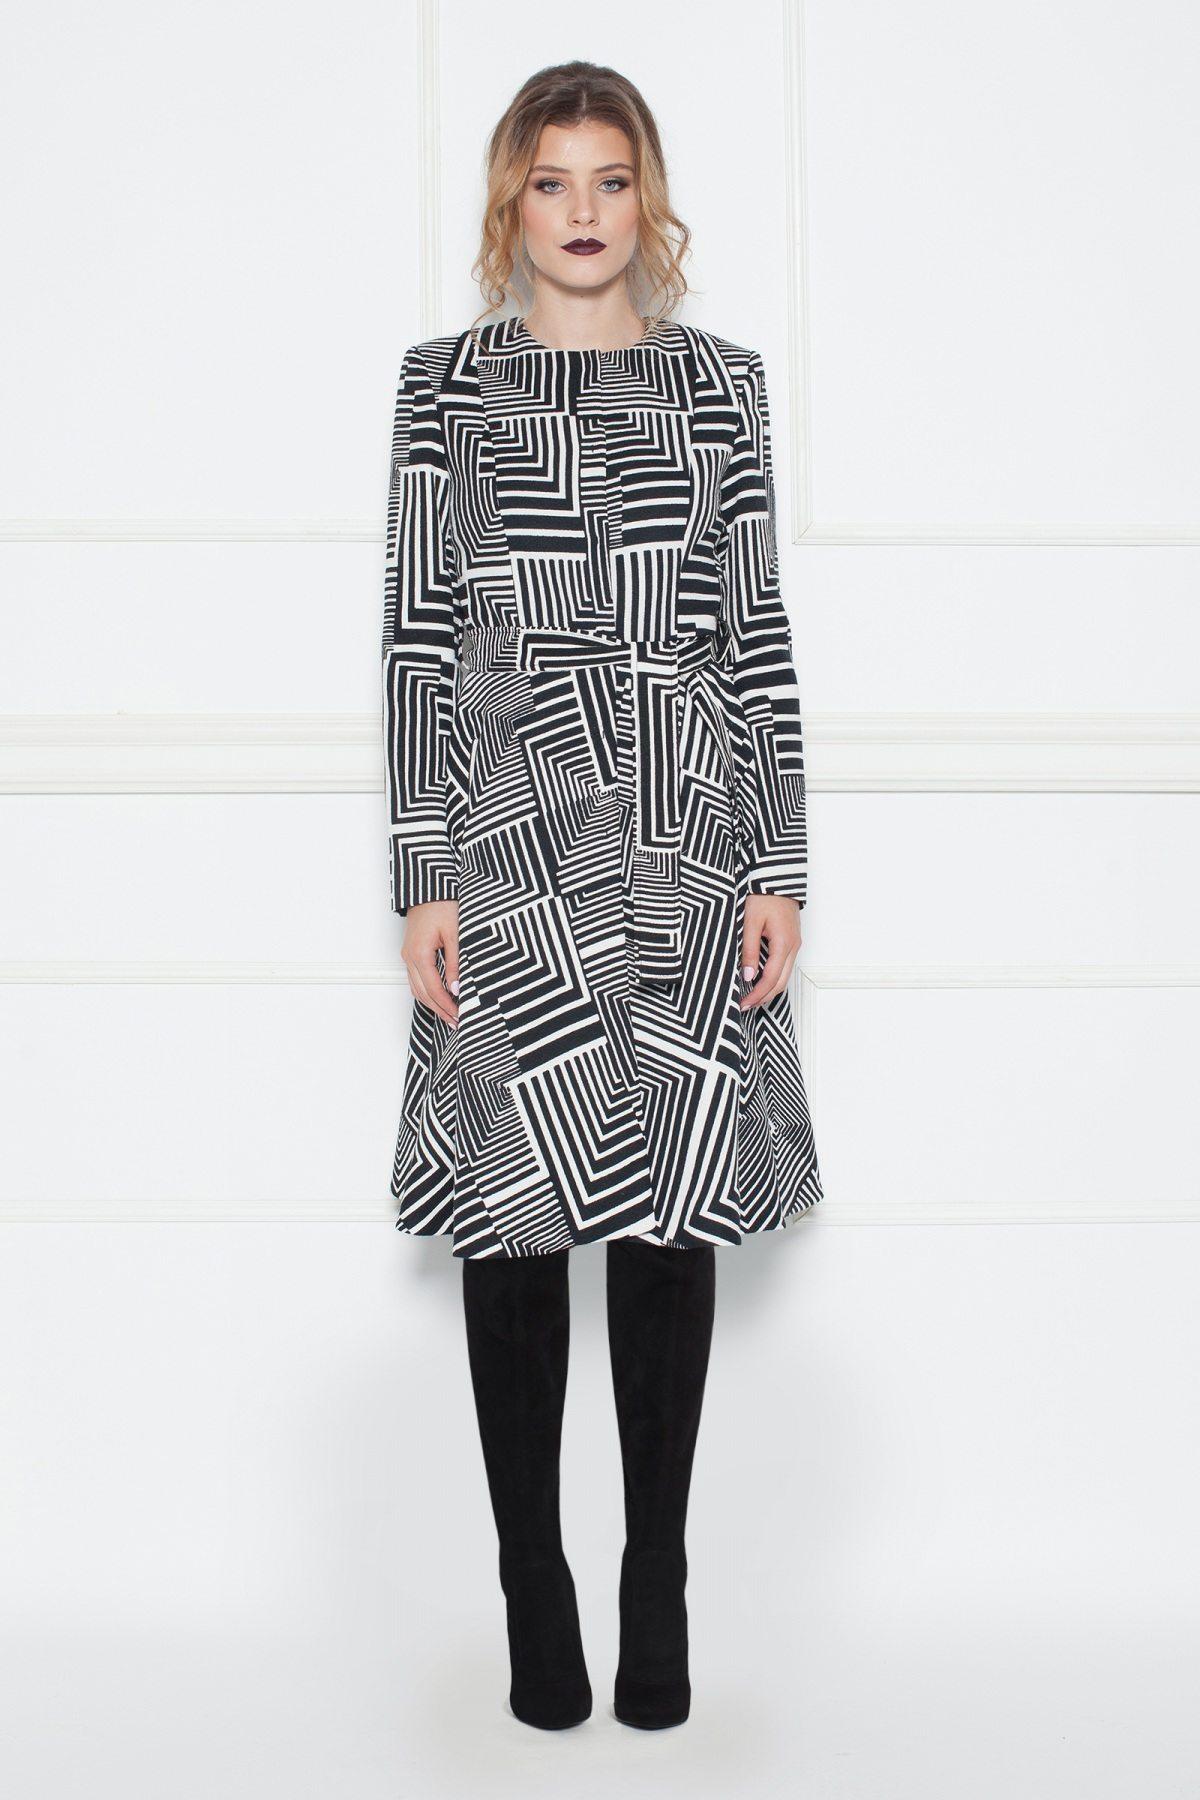 Palton cu print geometric Alb/Negru